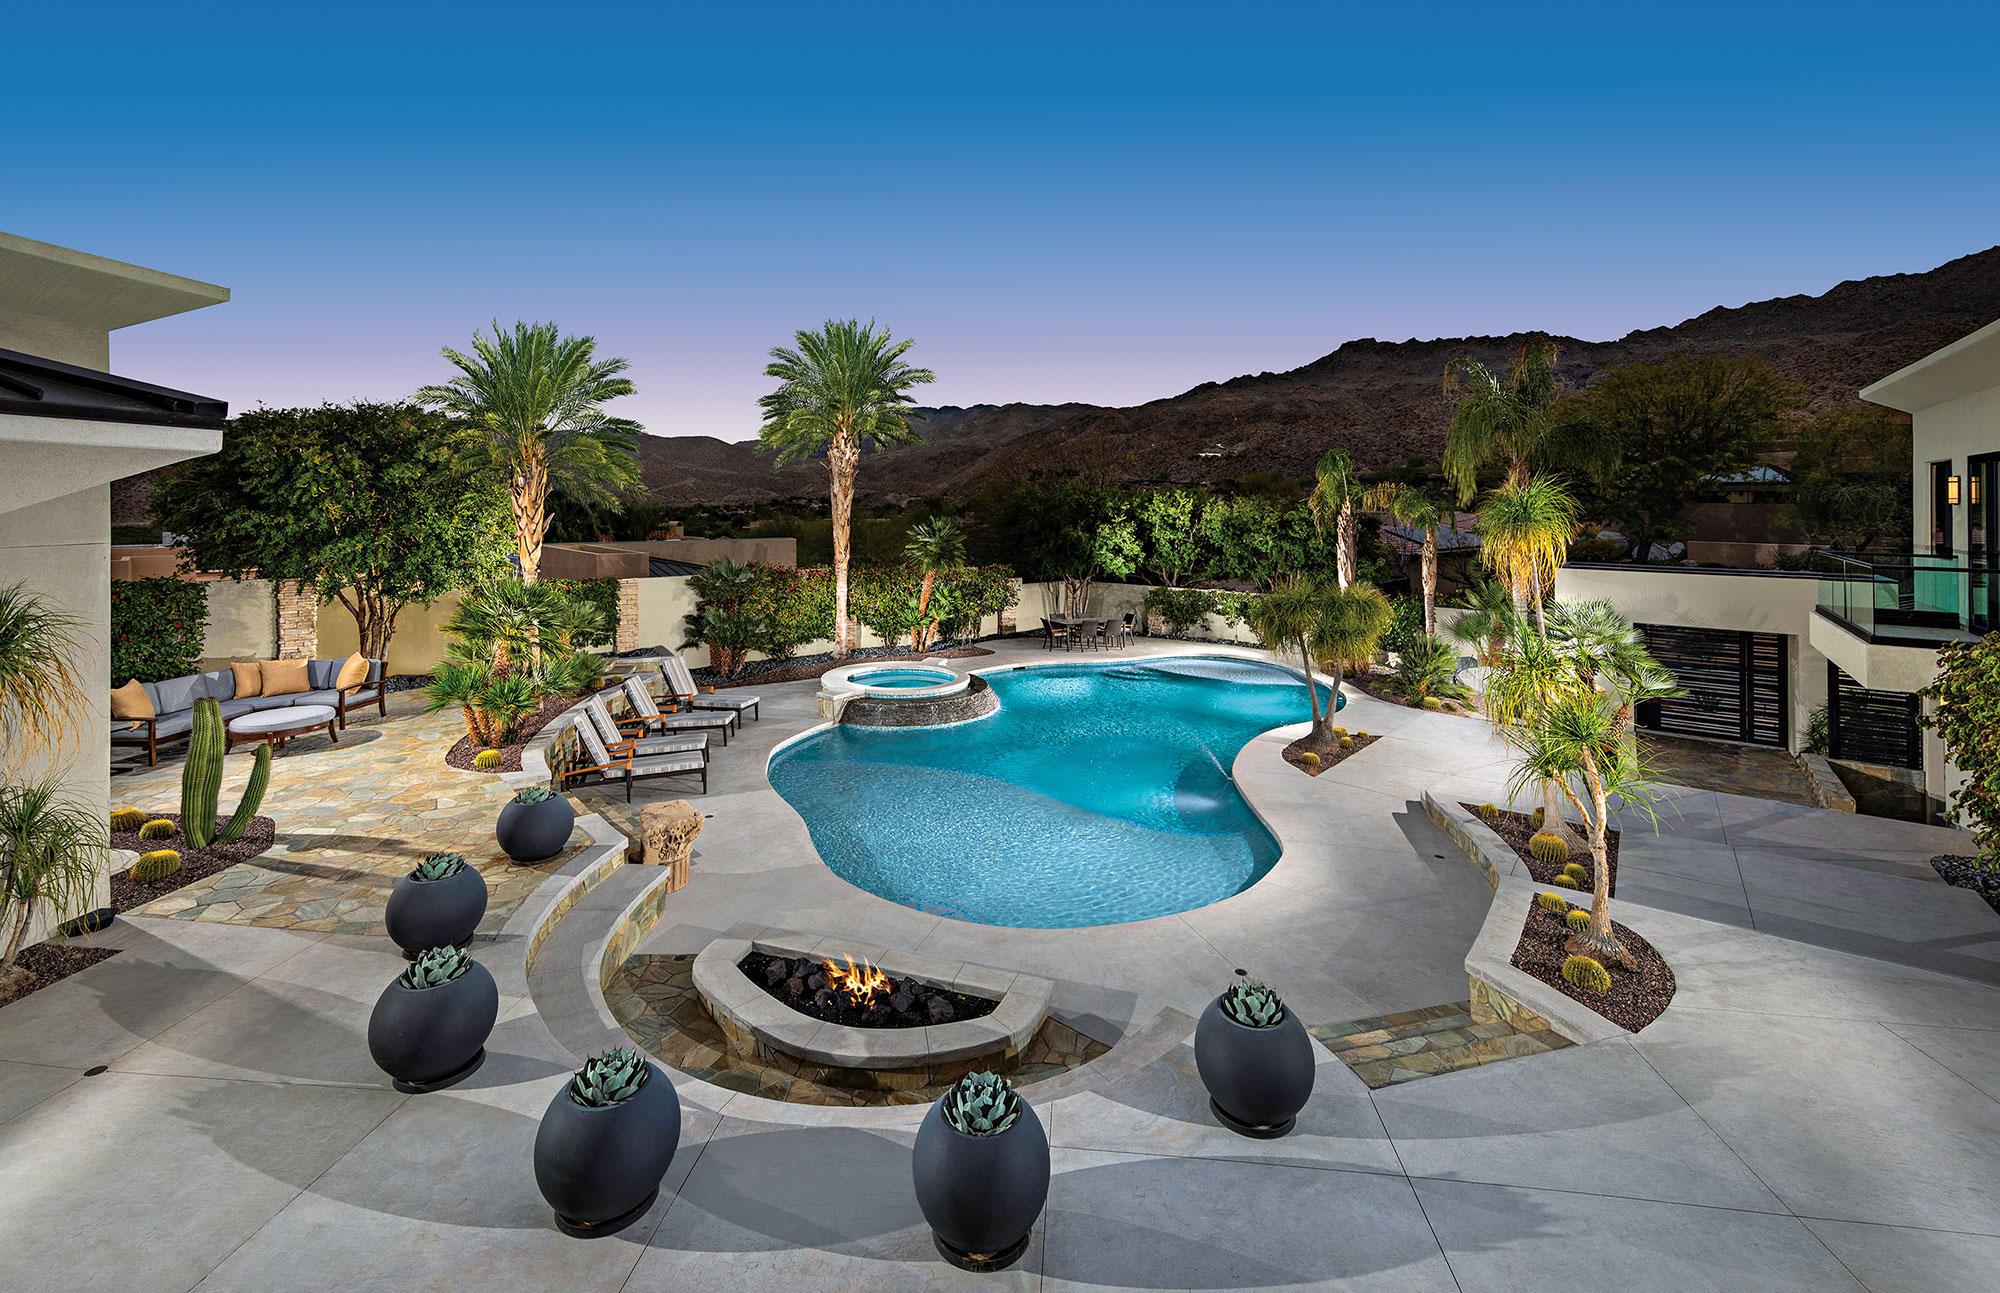 Photo of 178 Netas Drive, Palm Desert, CA 92260